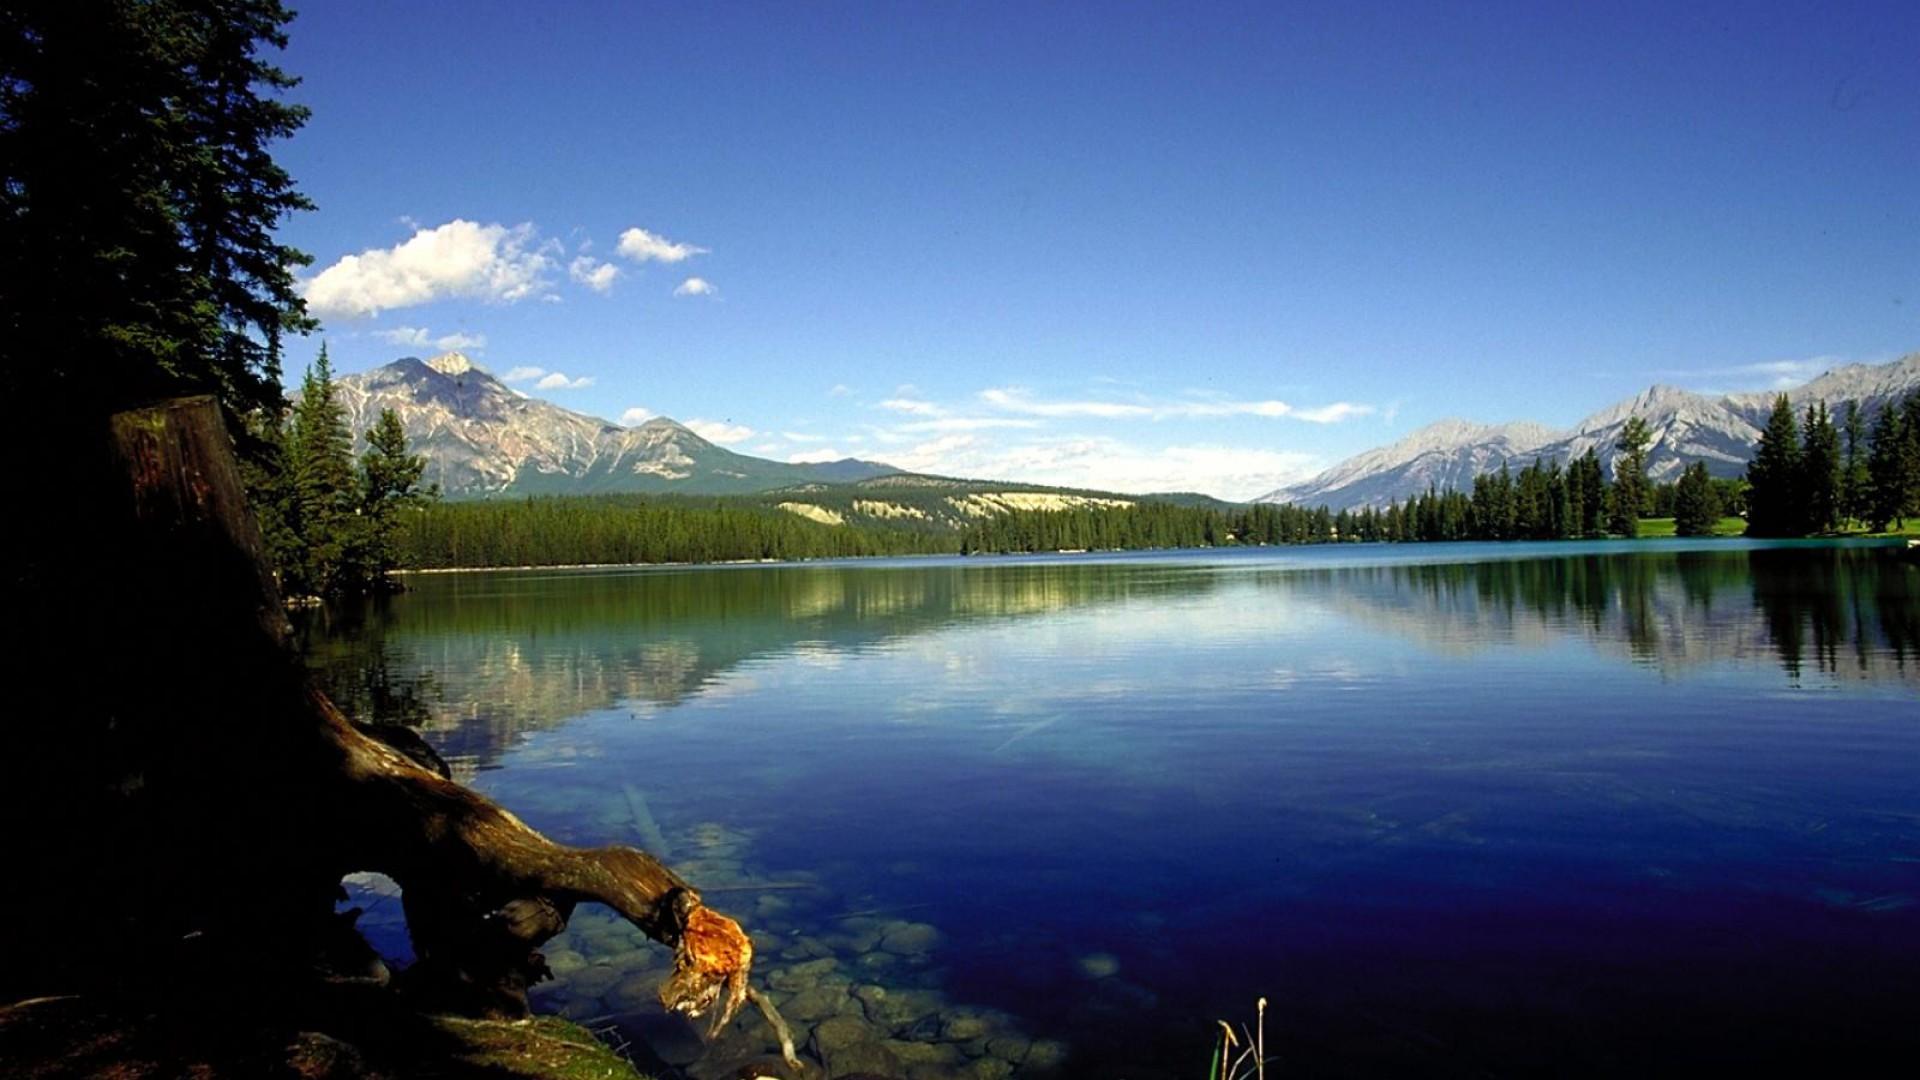 Nice Lake Image Nature Wallpaper